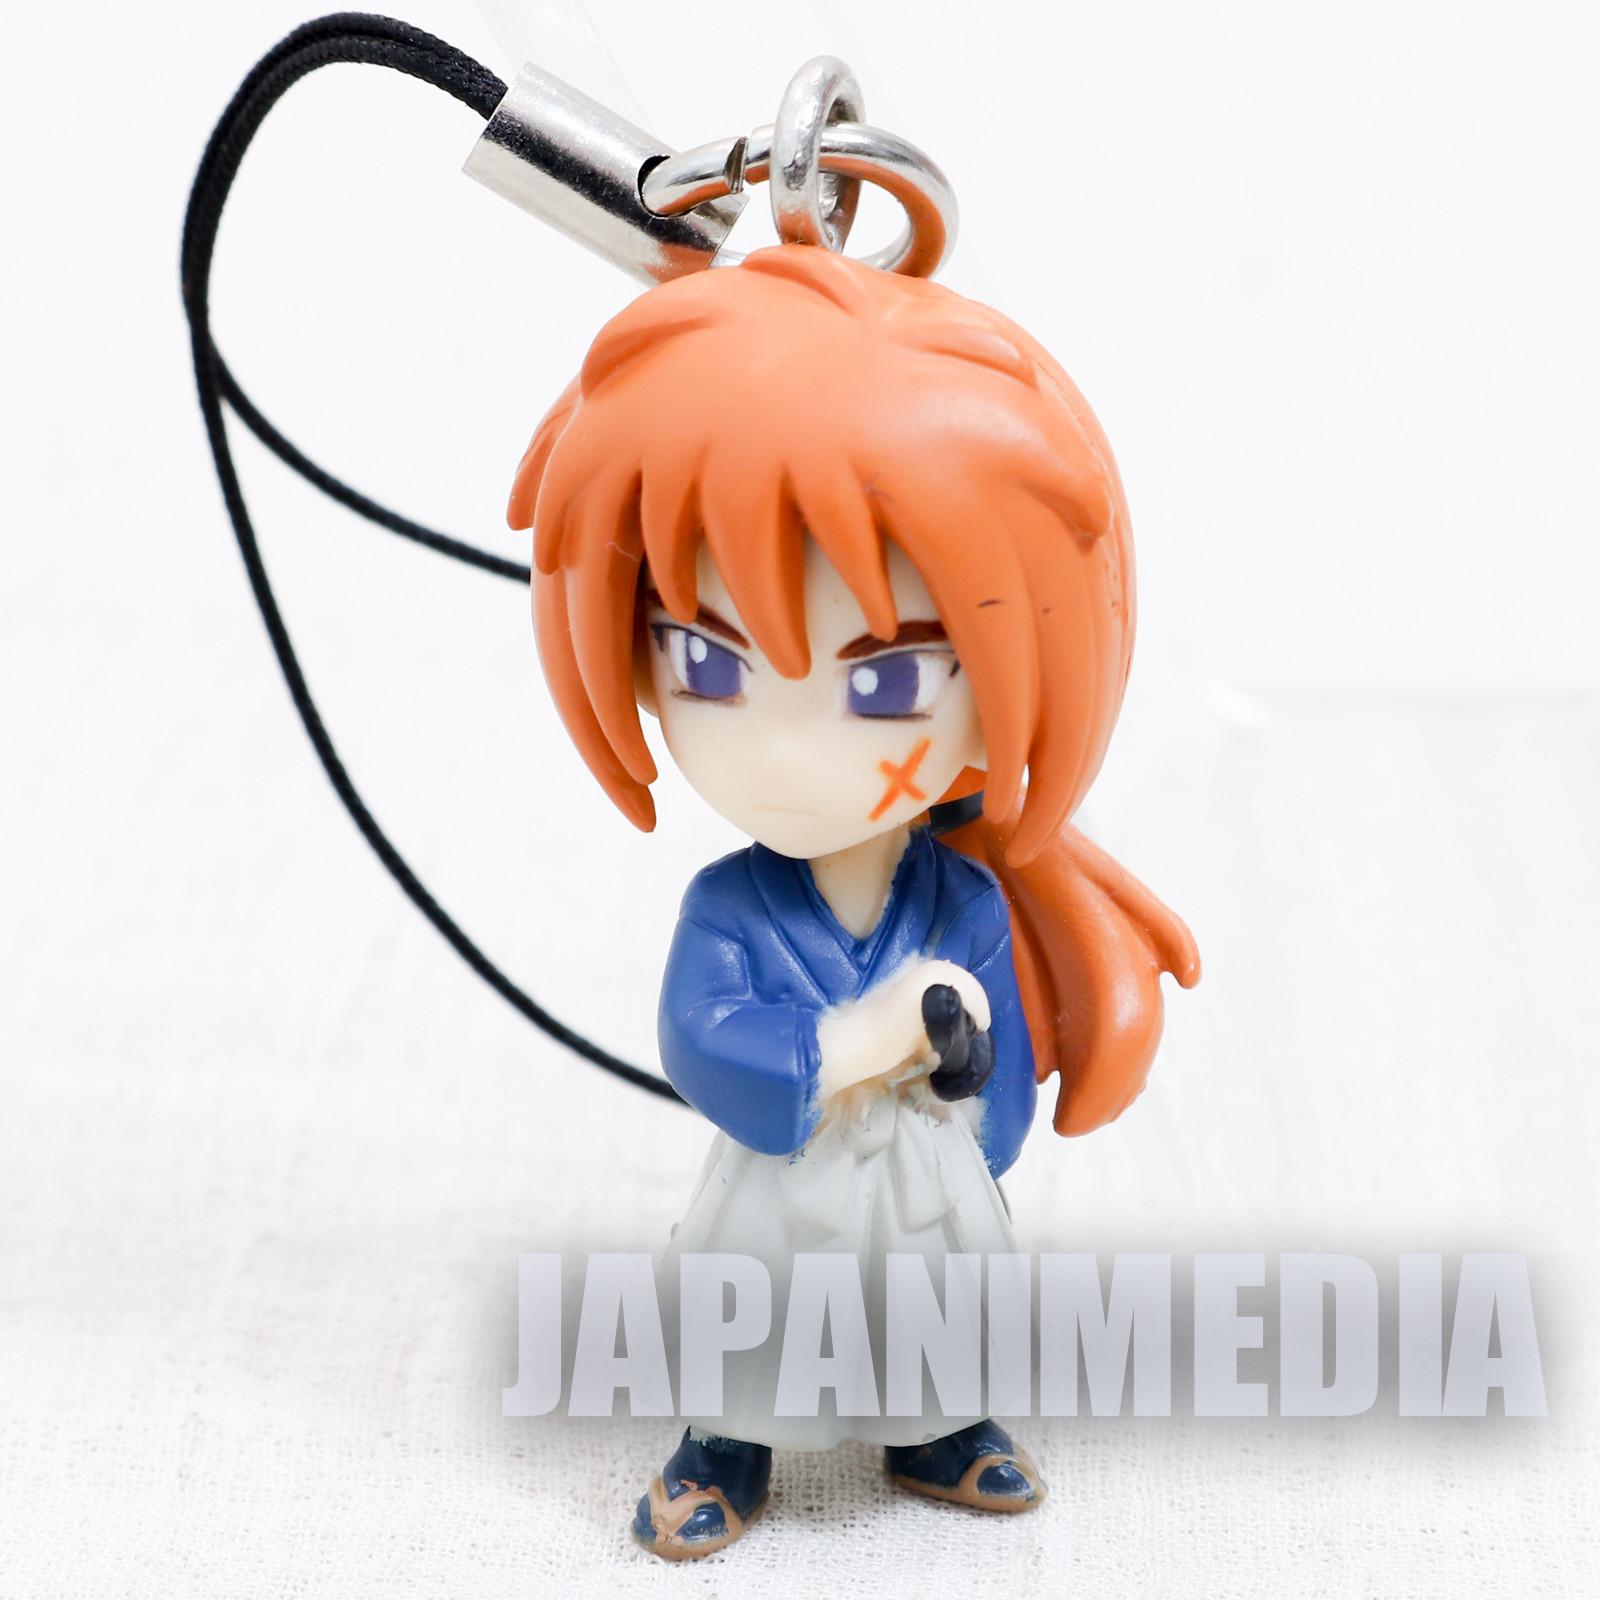 Rurouni Kenshin Himura Kenshin Blue Mascot Figure Strap Bandai JAPAN ANIME